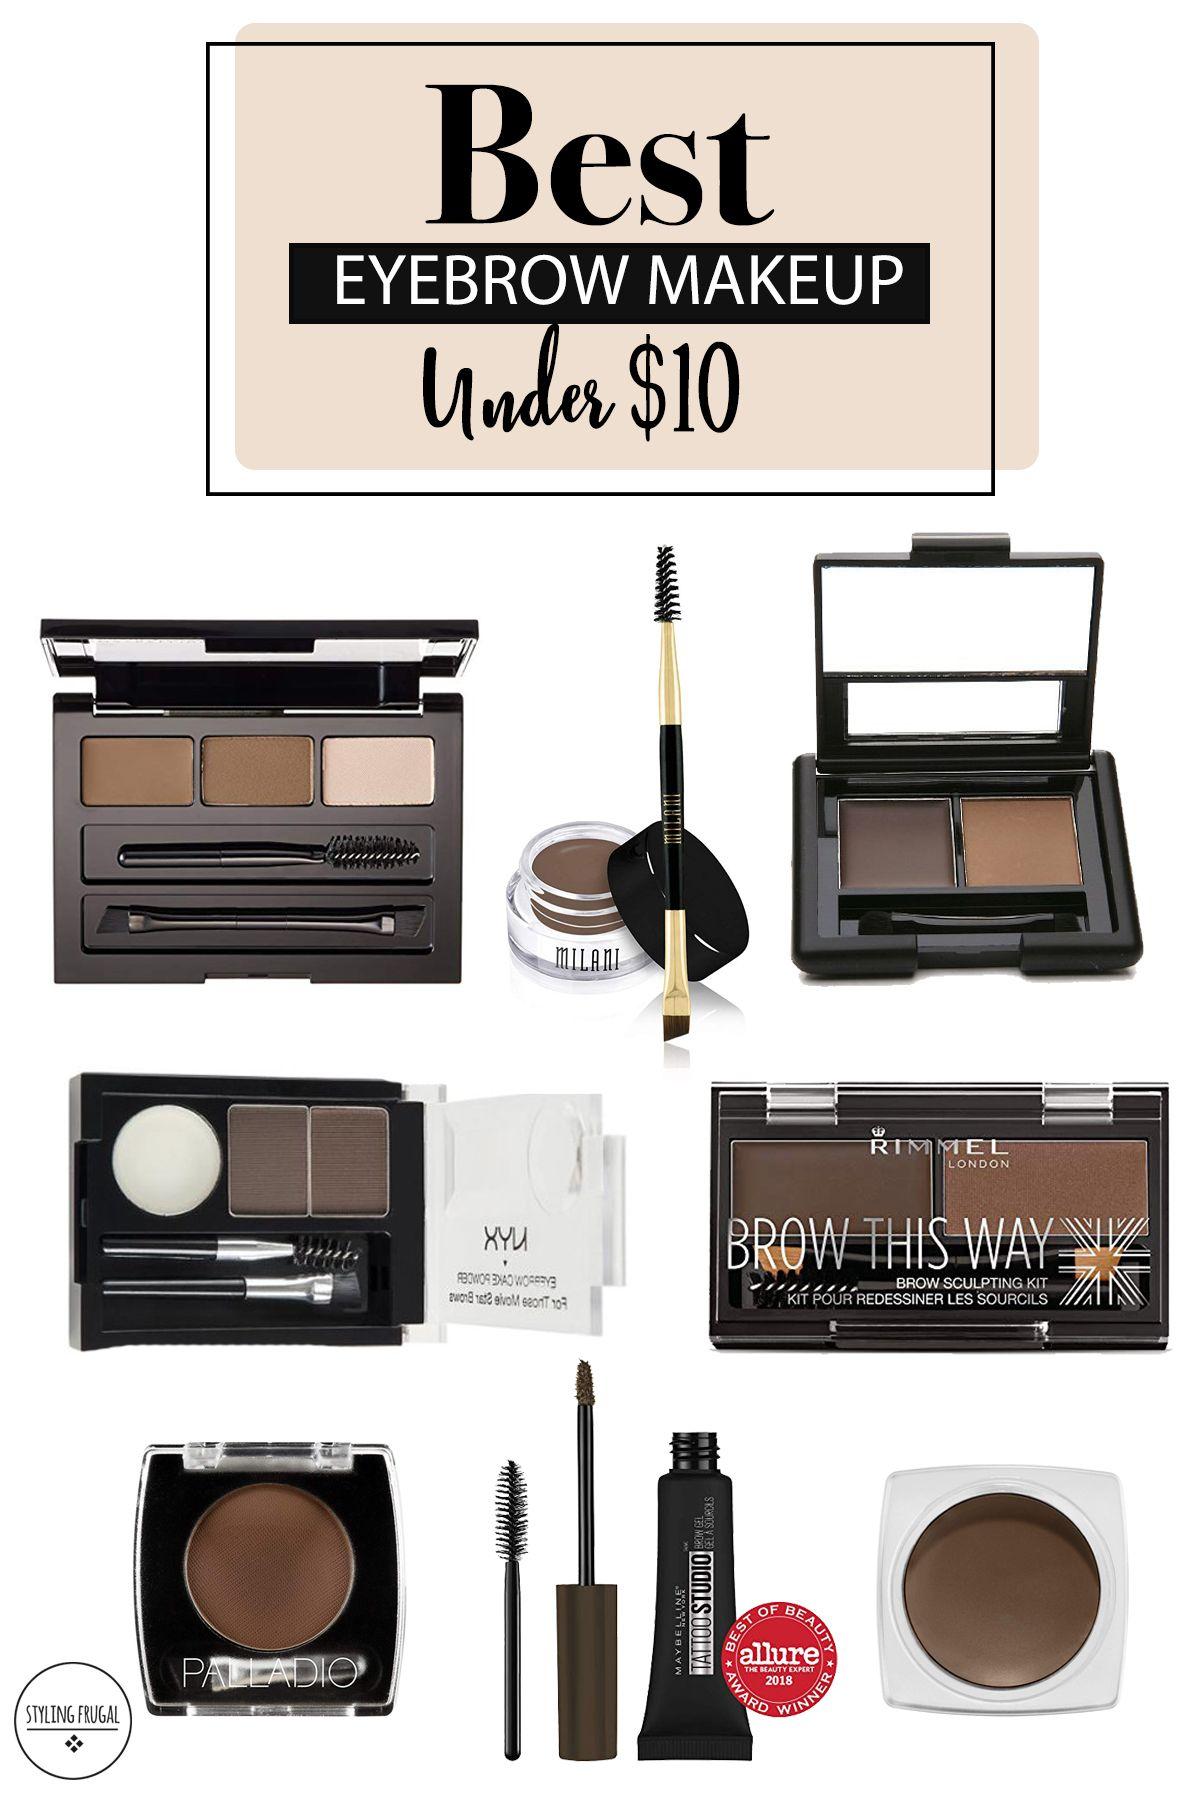 The Best Eyebrow Makeup Products Best eyebrow makeup